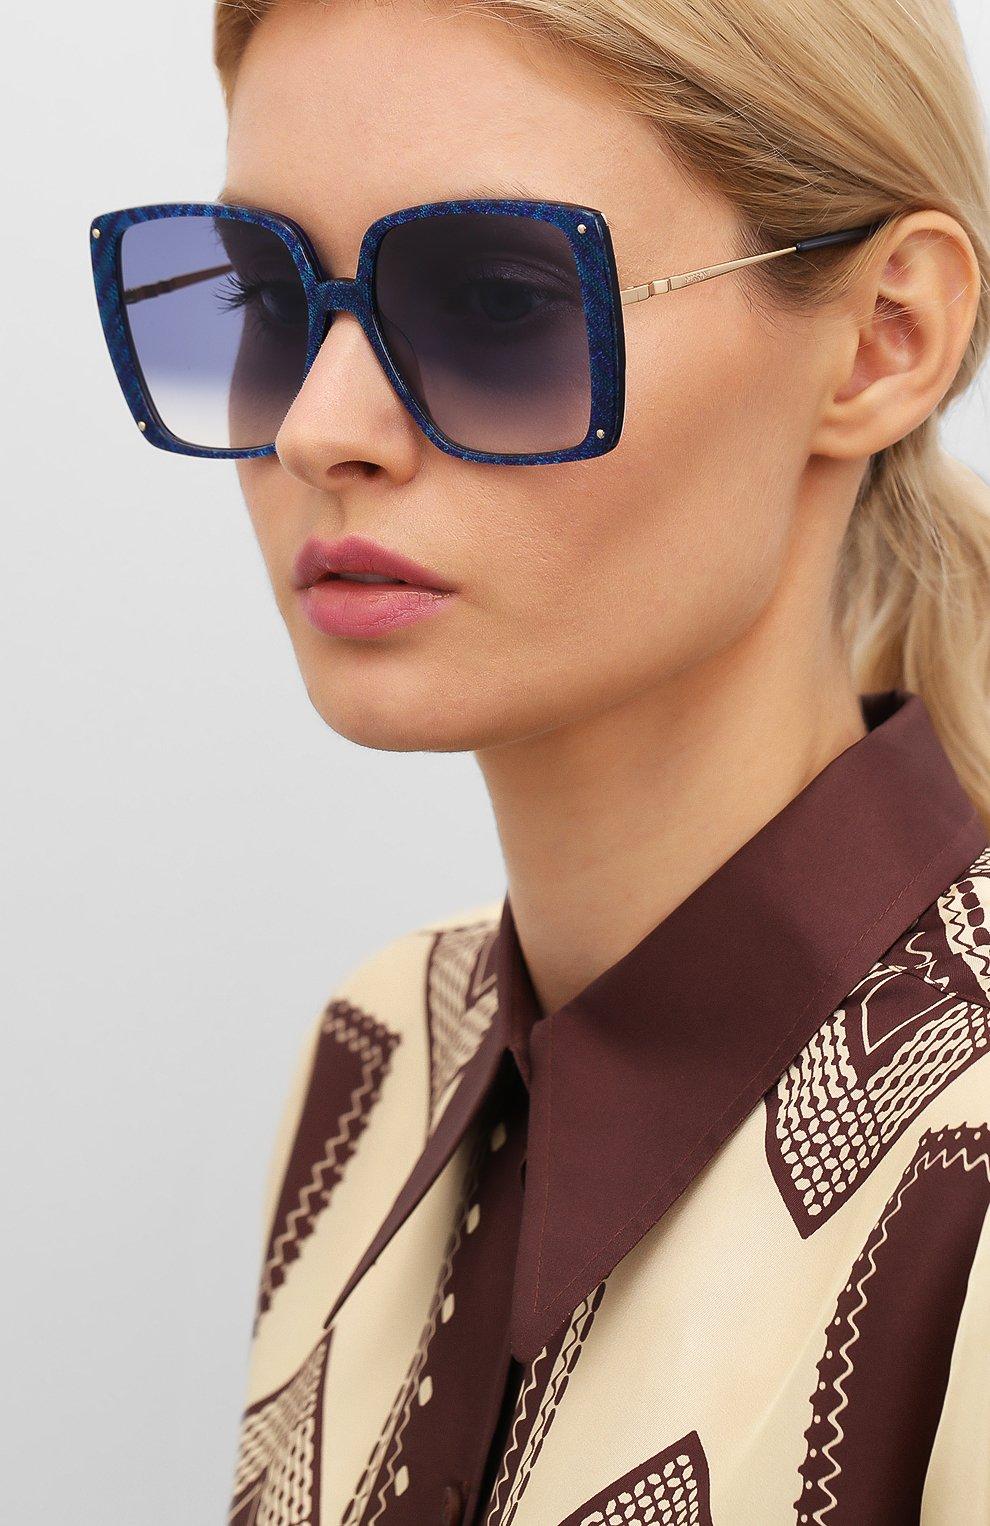 Женские солнцезащитные очки MISSONI синего цвета, арт. MIS0002 S6F | Фото 2